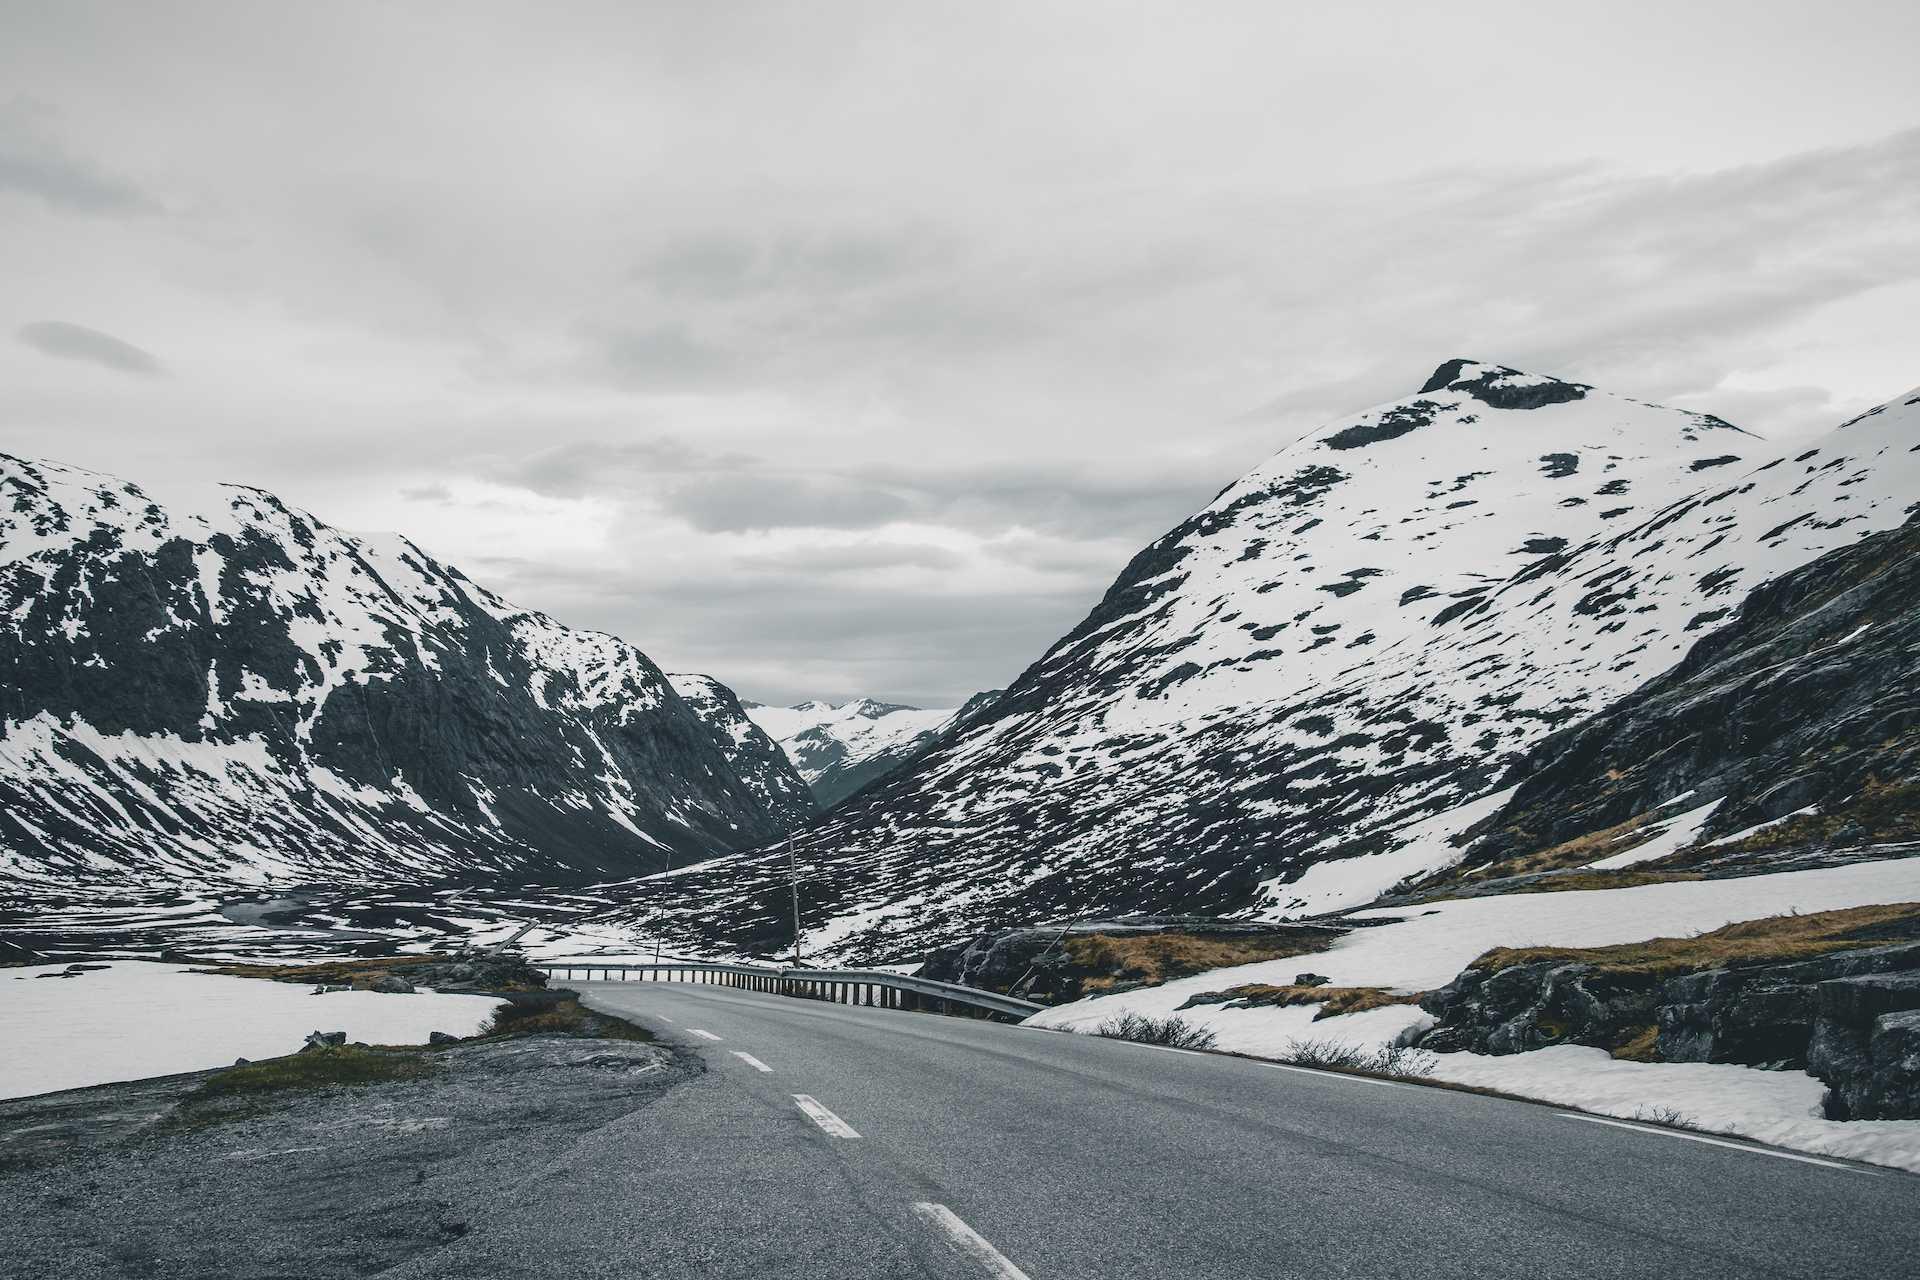 Droga 63 Norwegia